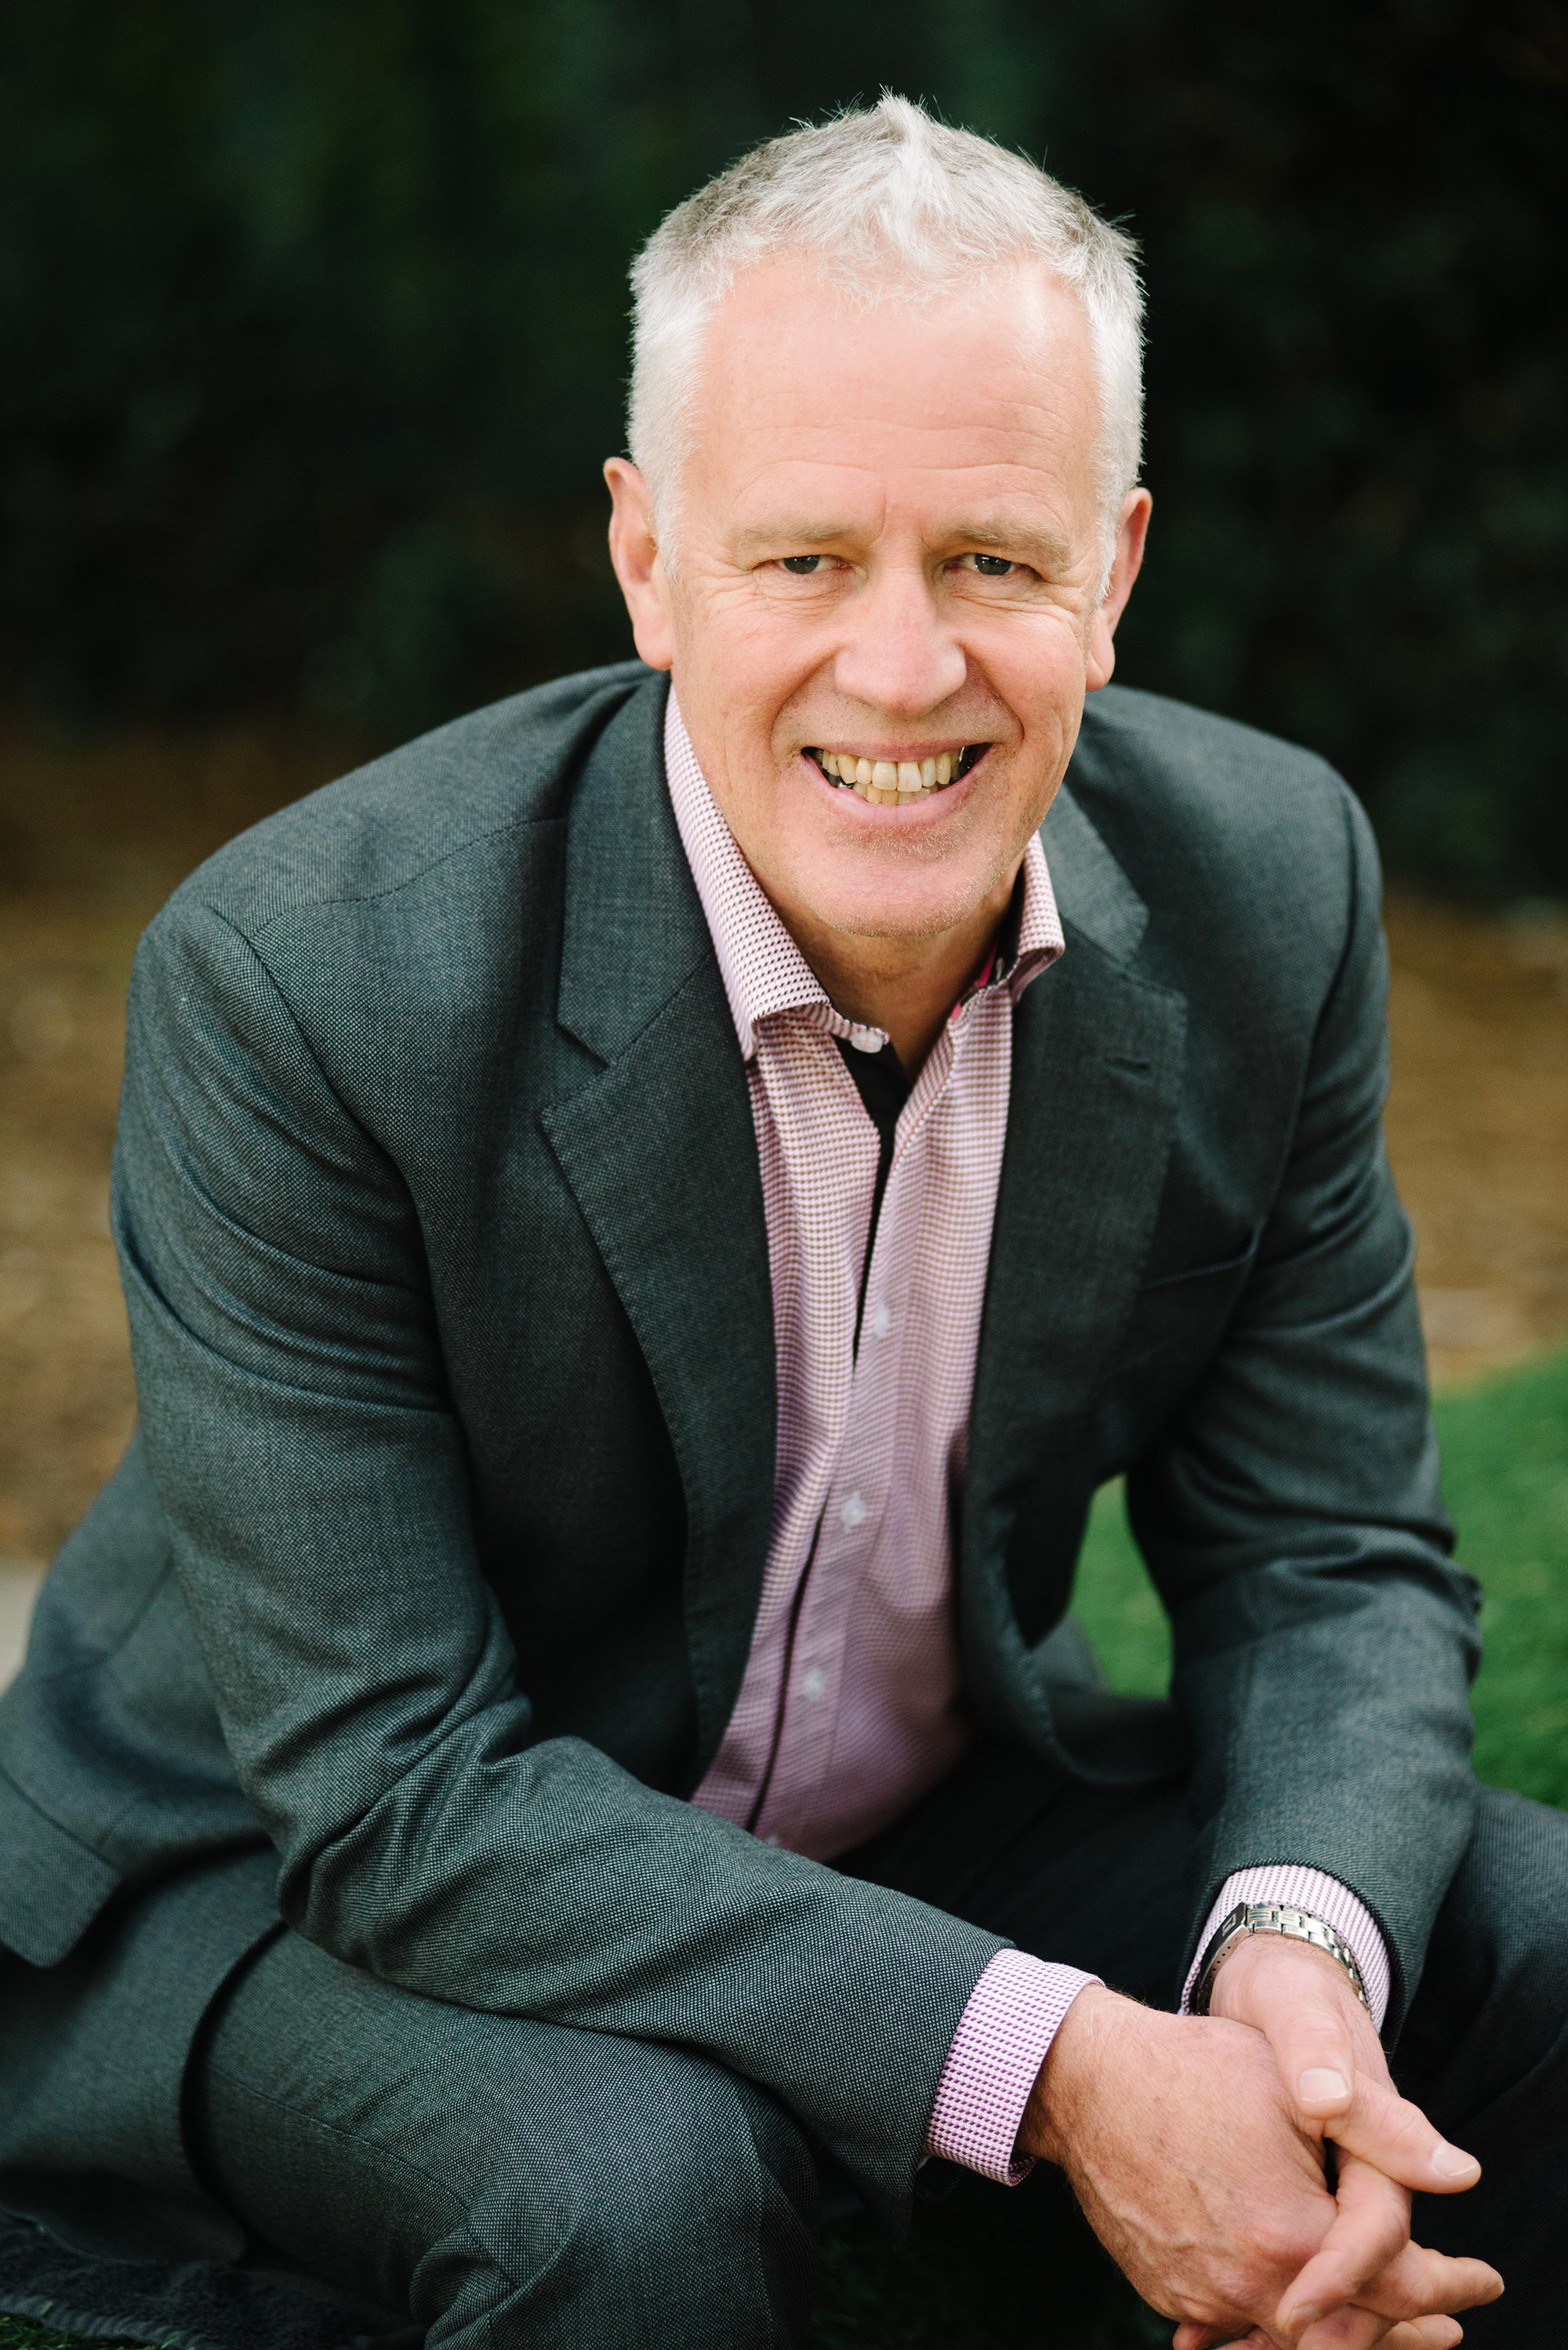 Michael Grose